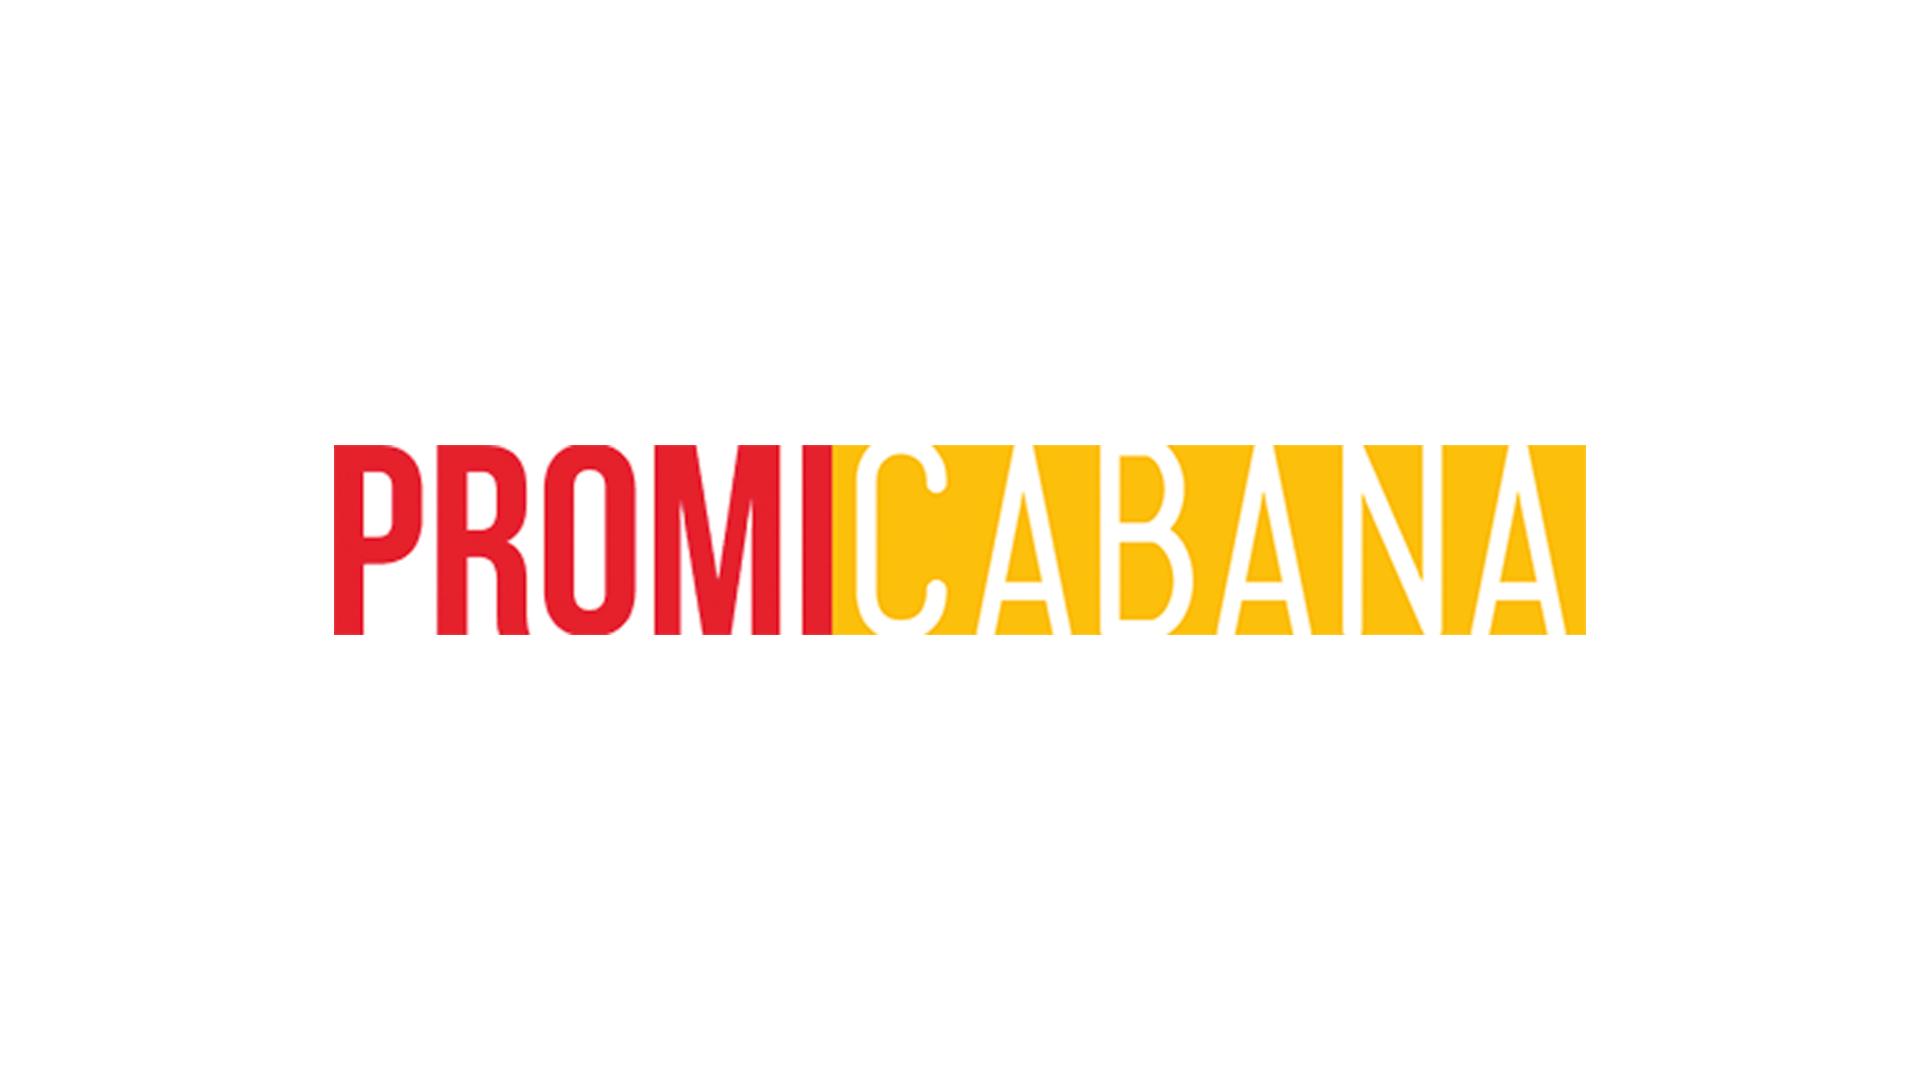 Shia-LaBeouf-Nazi-Livestream